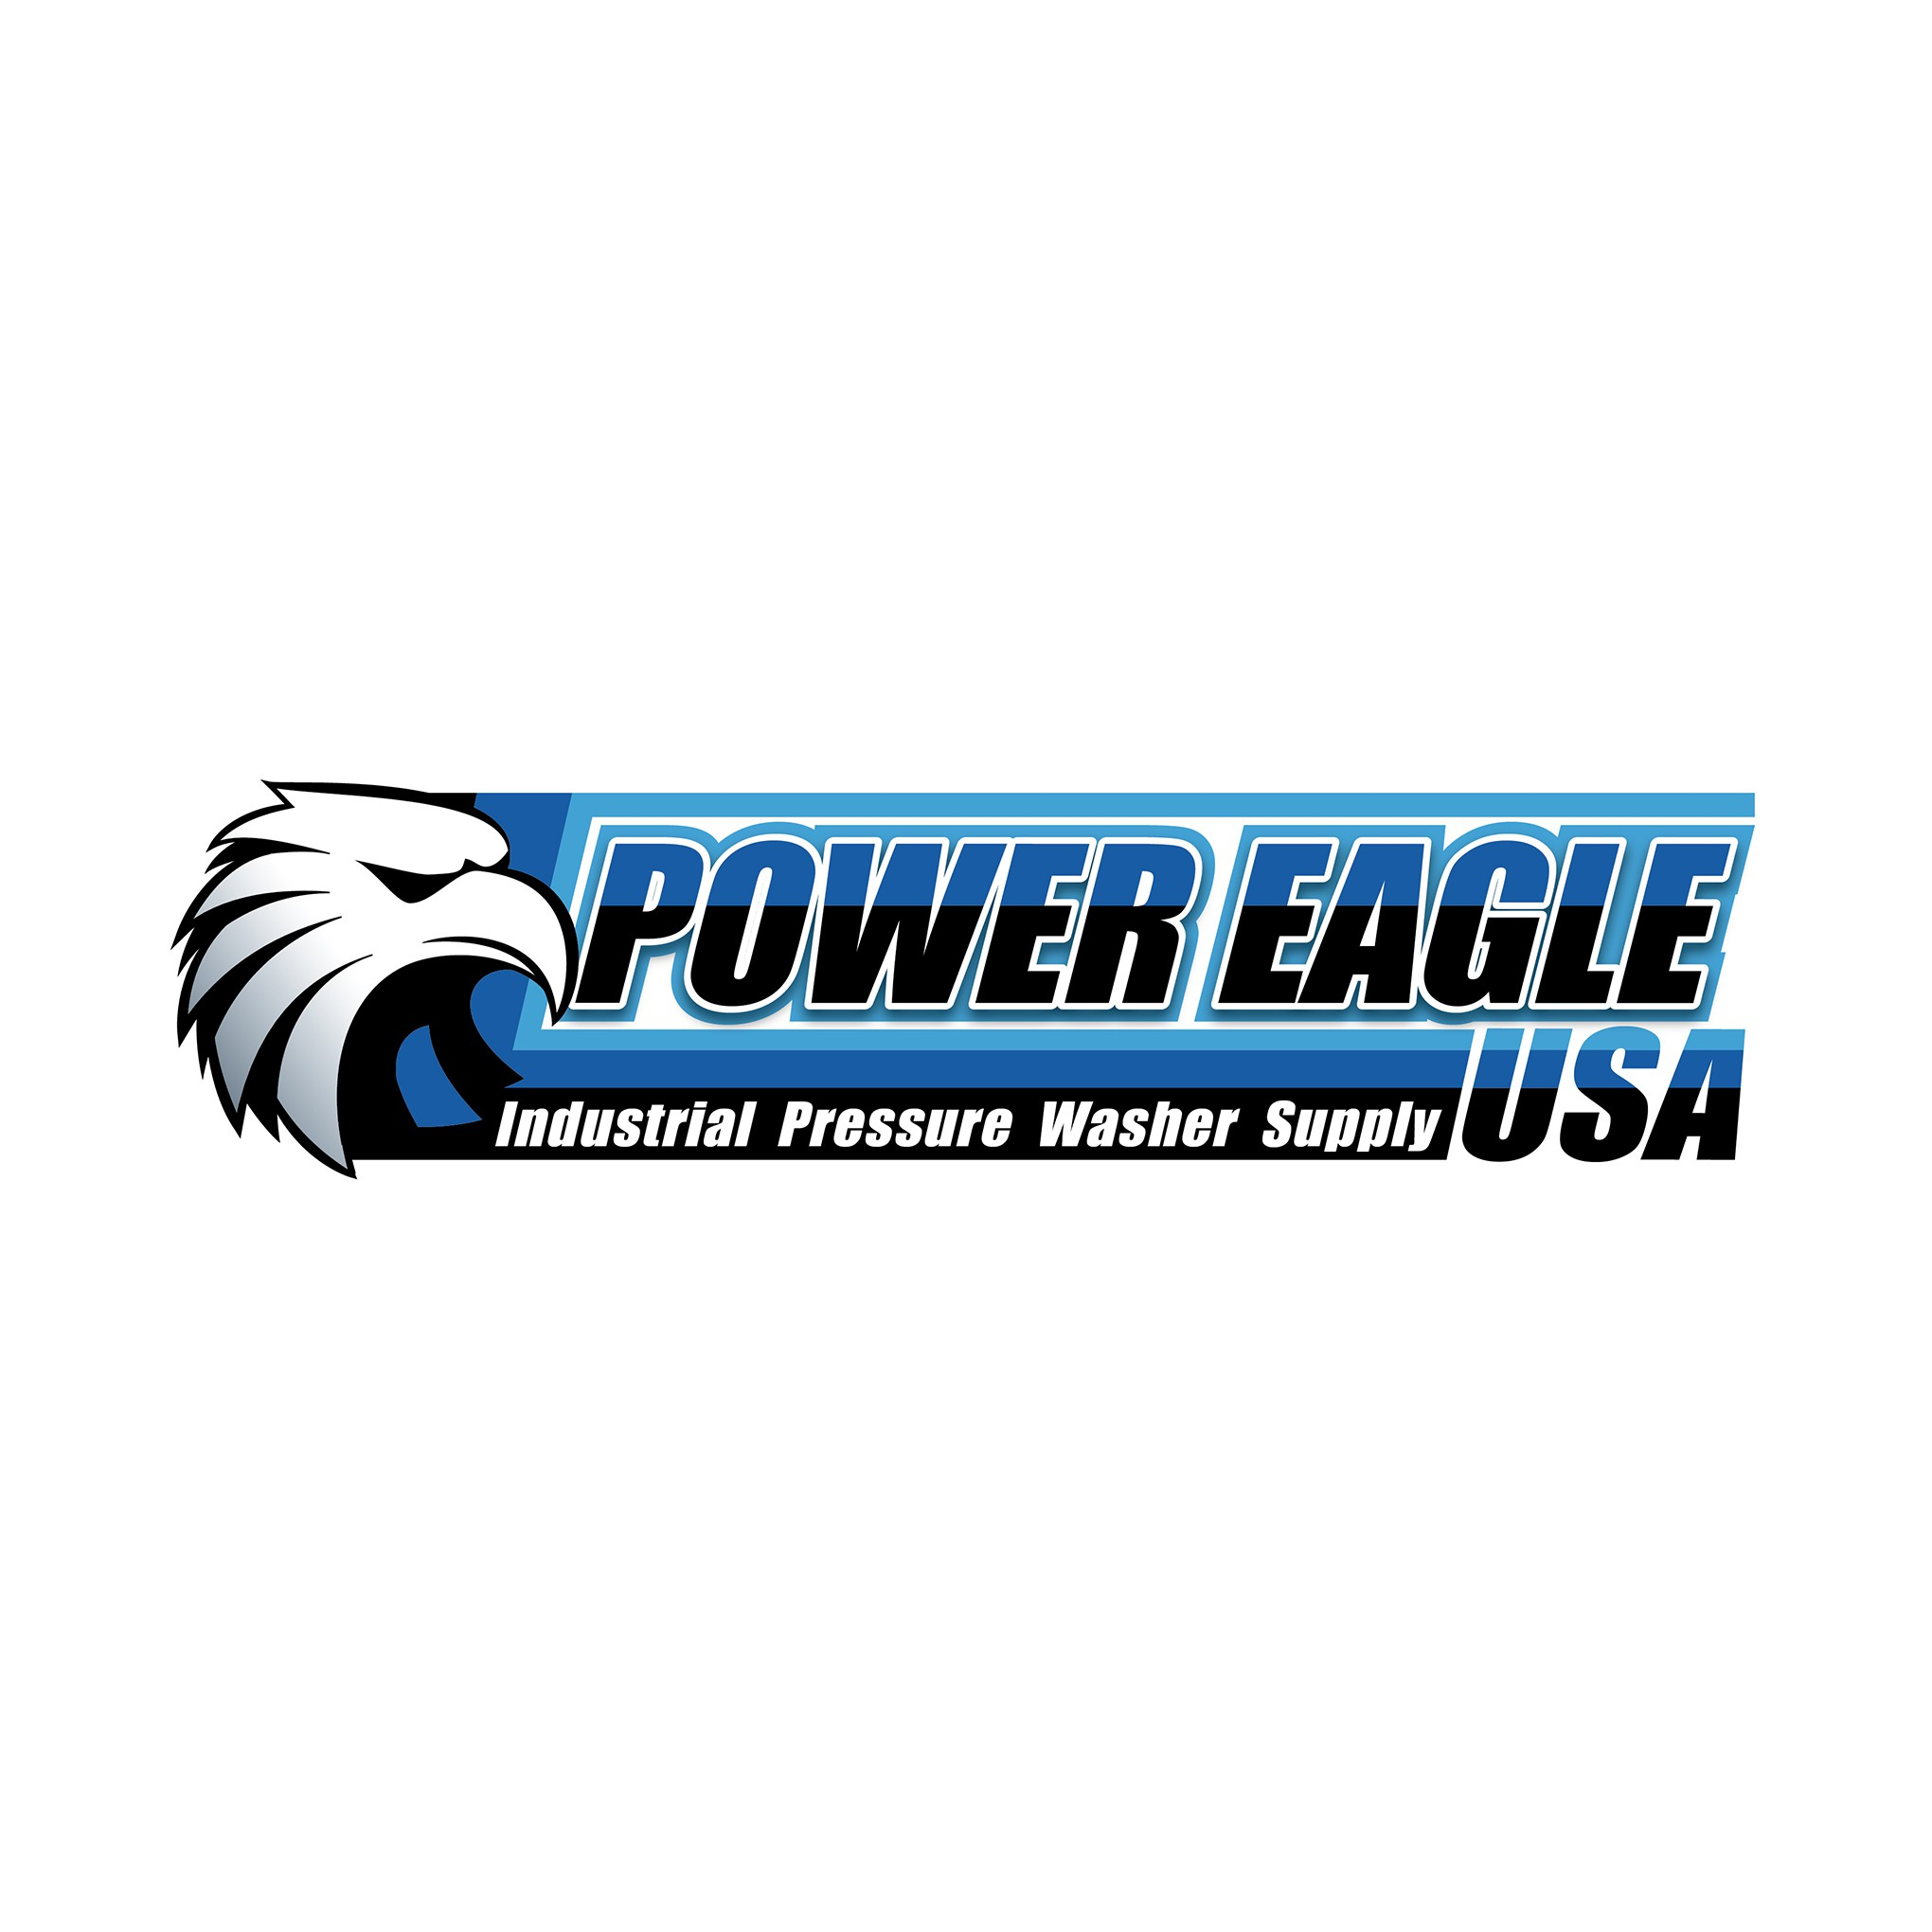 Industrial equipment brand seeking powerful logo